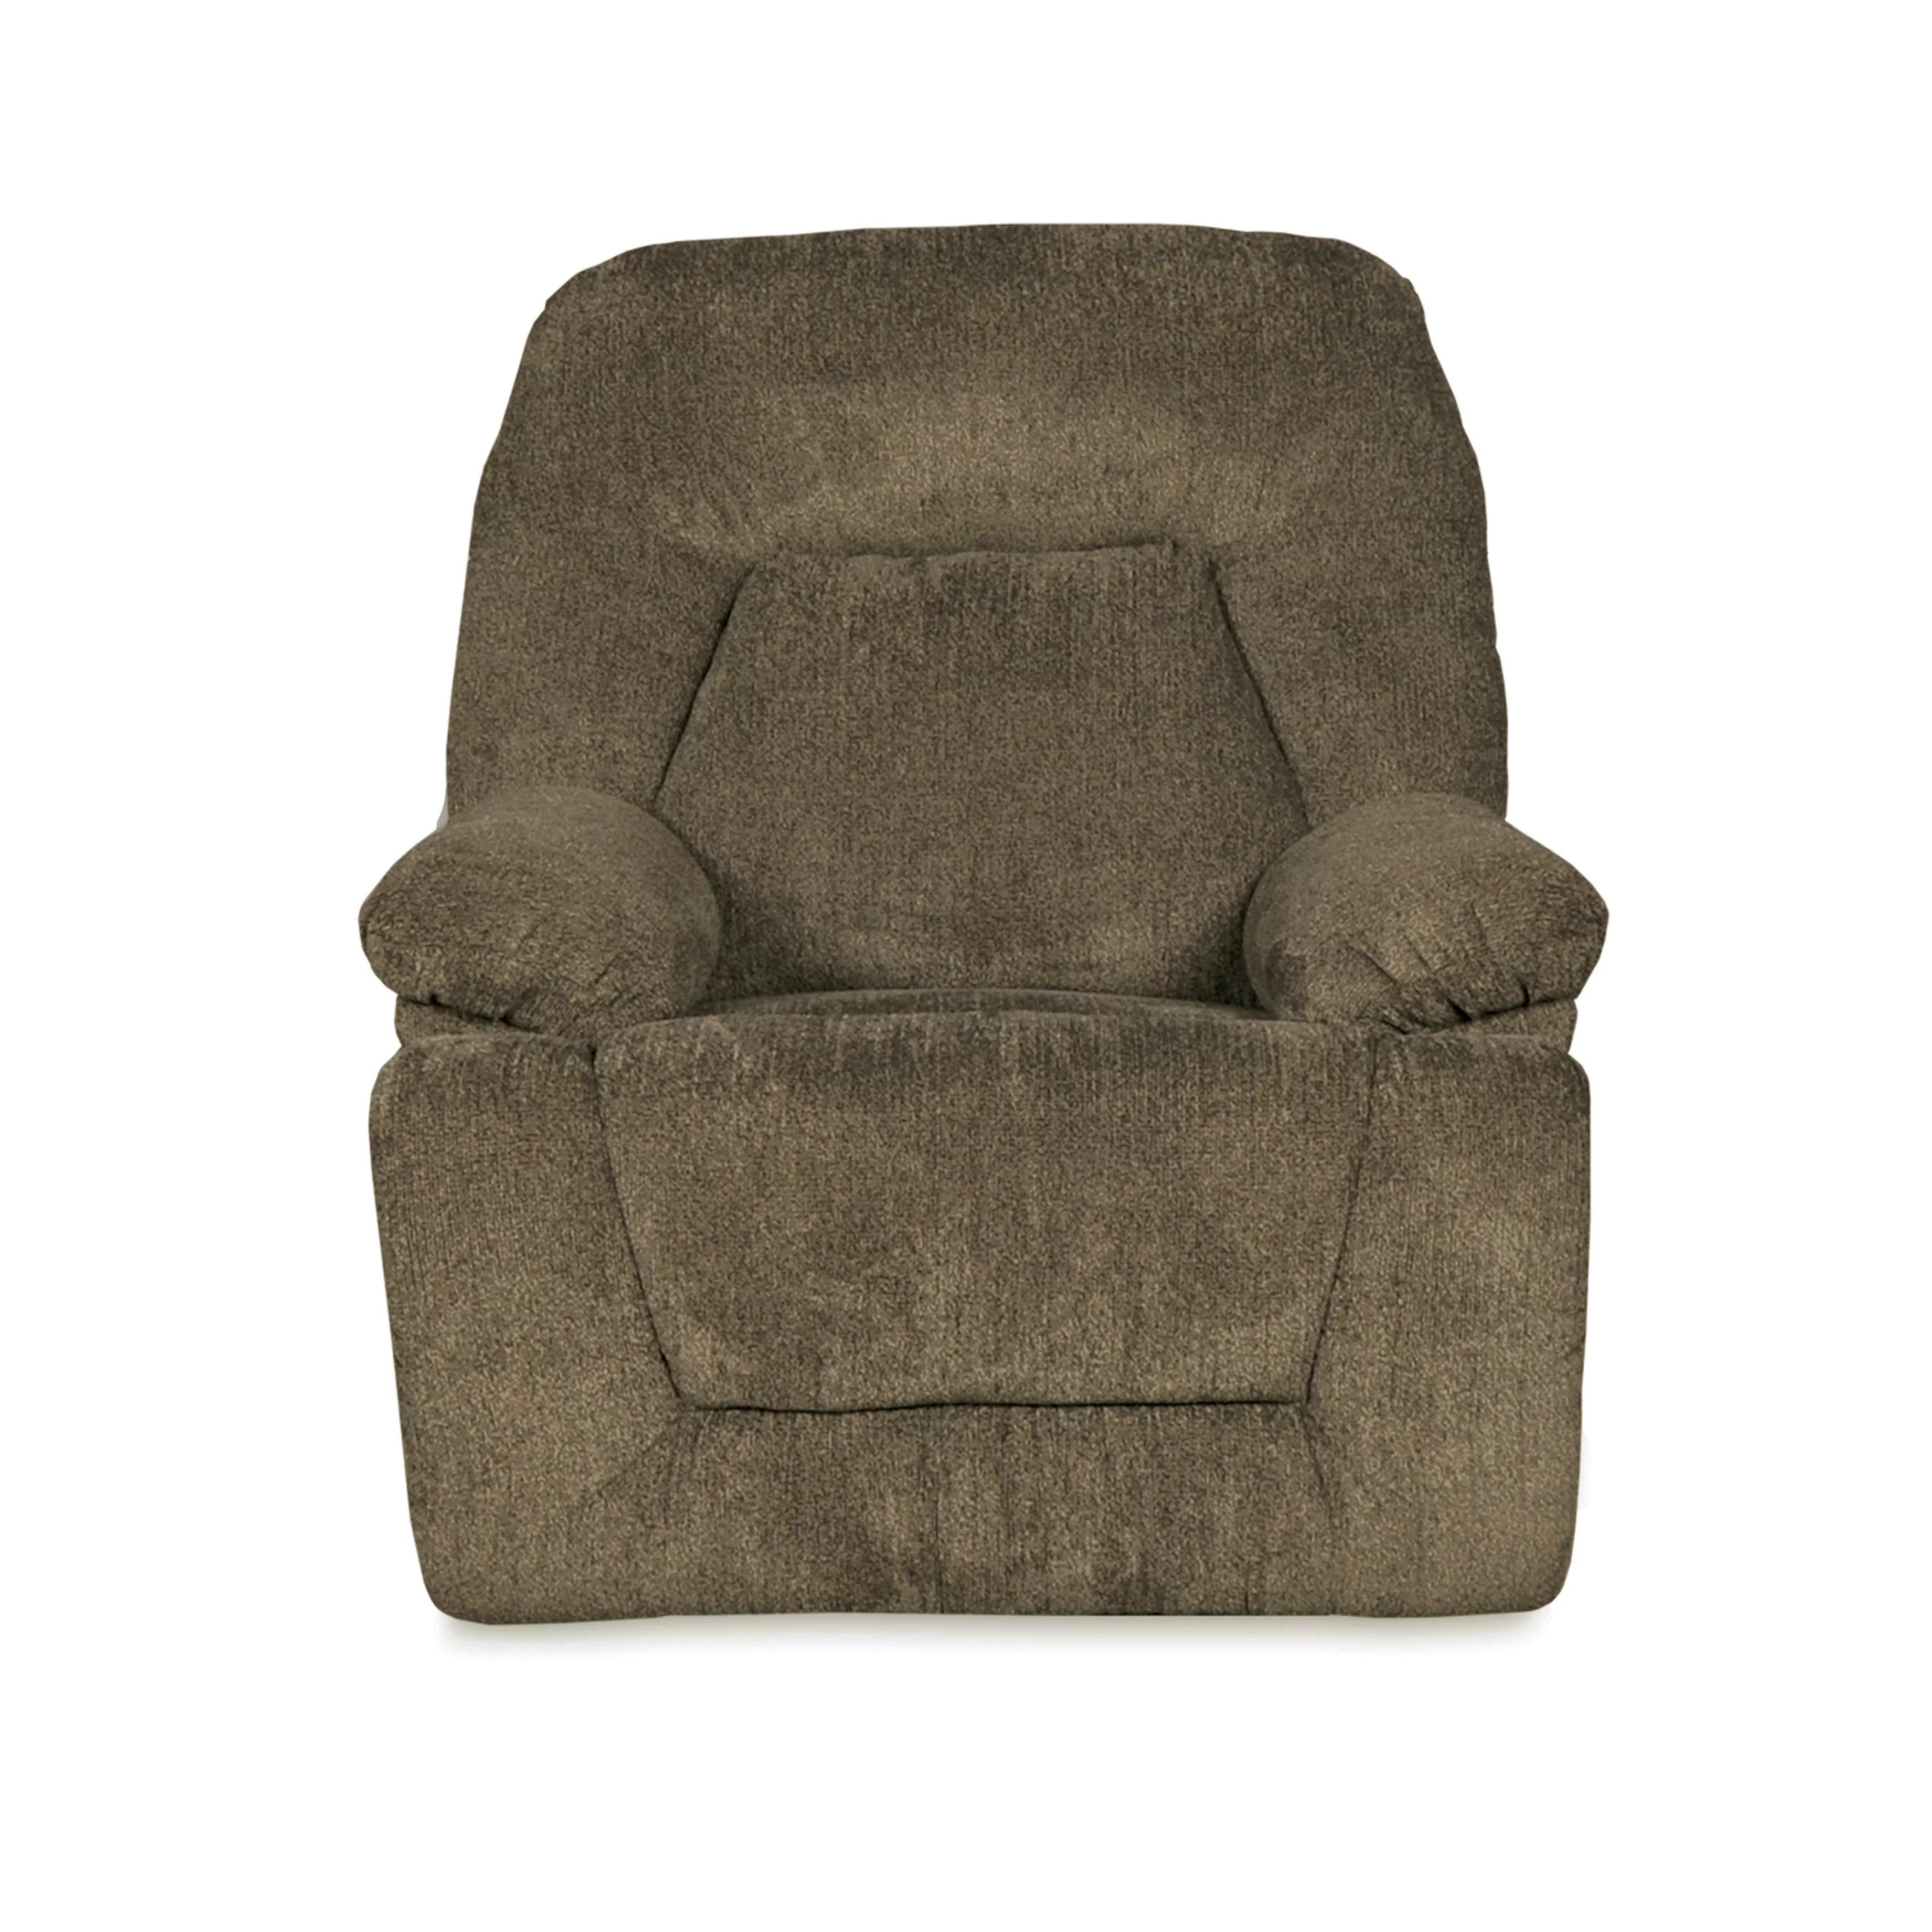 Revoluxion Furniture Co Madison Swivel Rocker Recliner